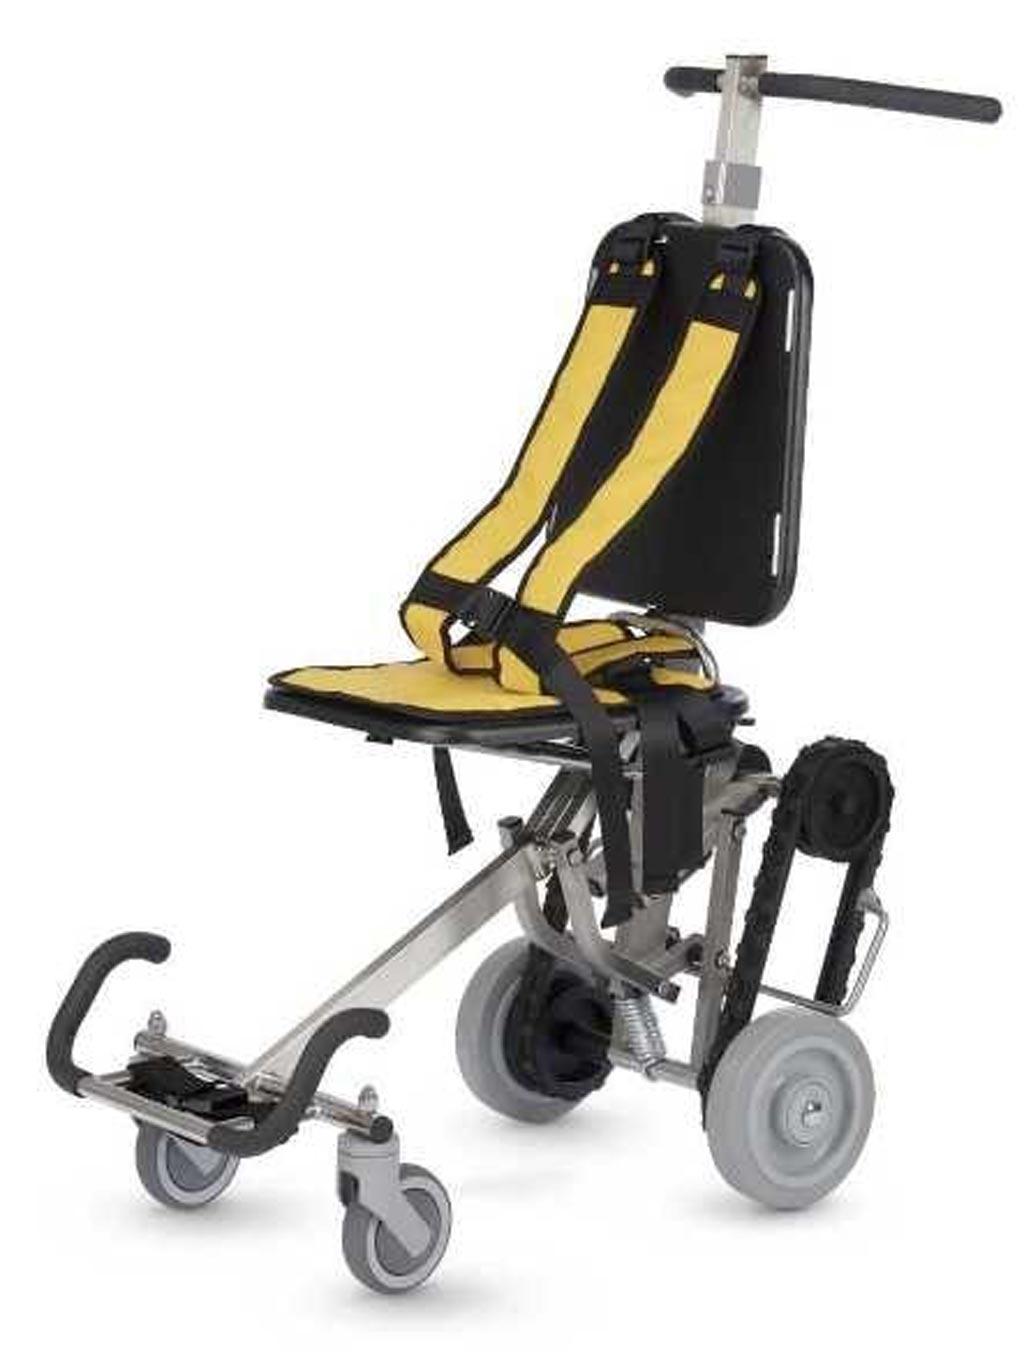 Image: The IBEX ambulance chair (Photo courtesy of ParAid Medical).